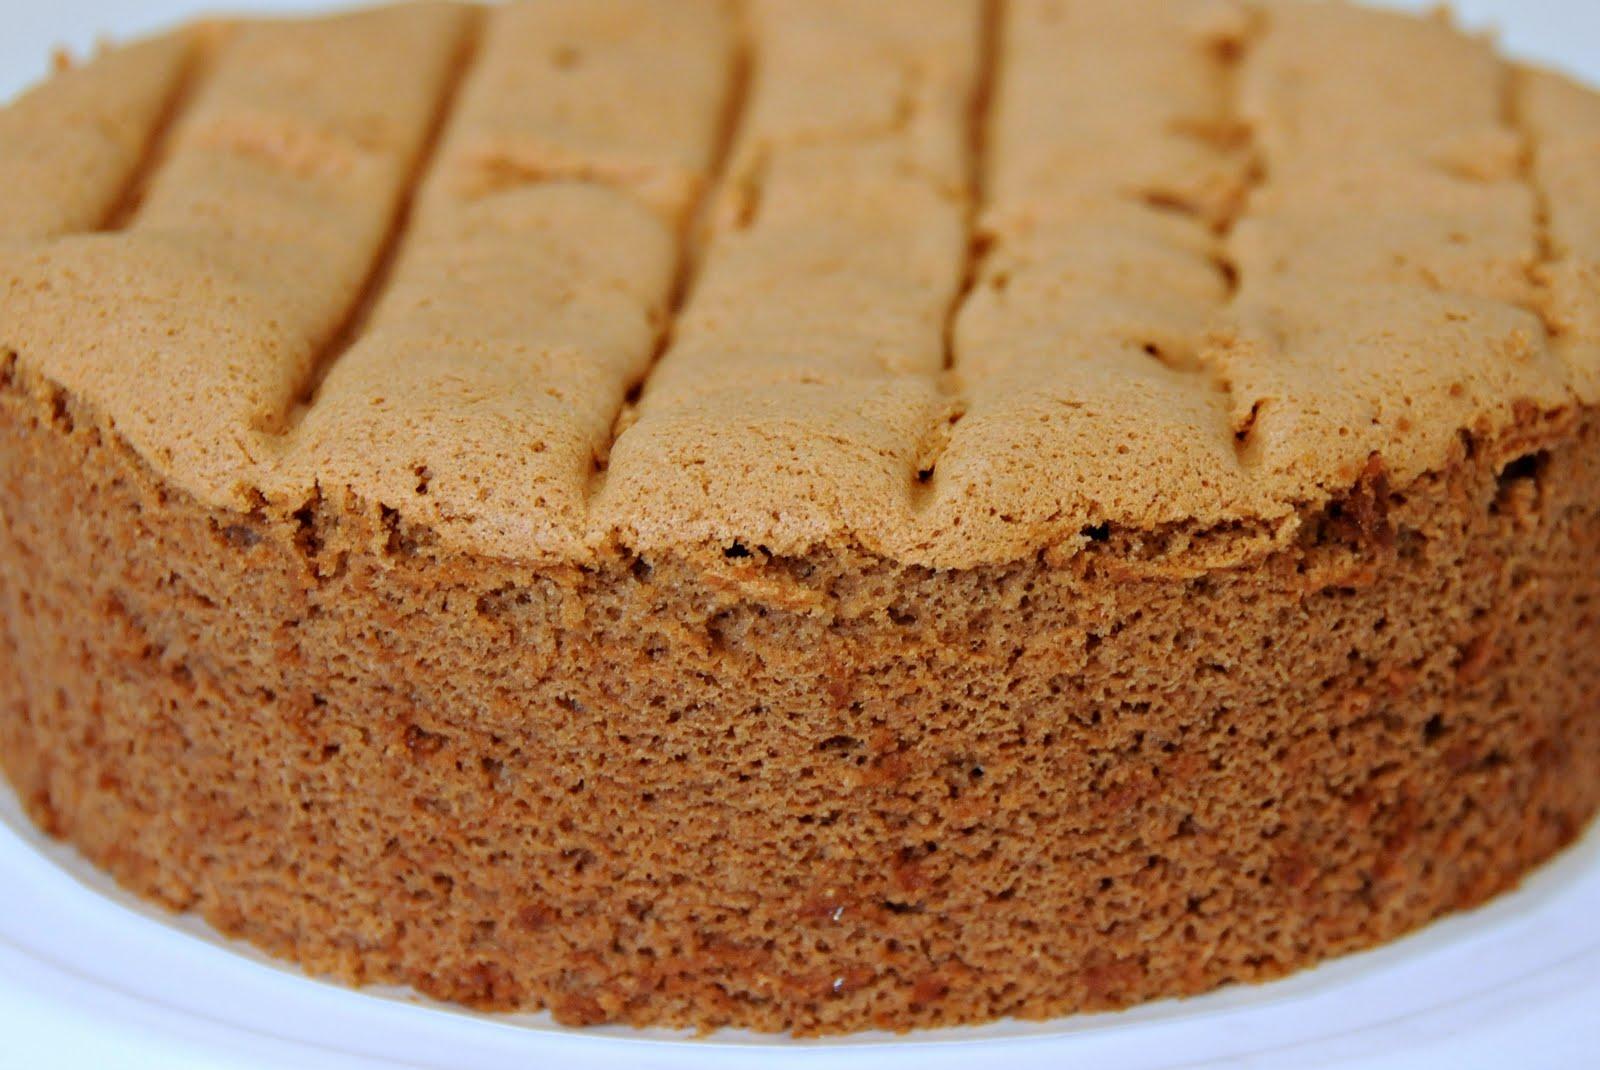 my-sweet-hut: Chocolate Sponge Cake (Basic)